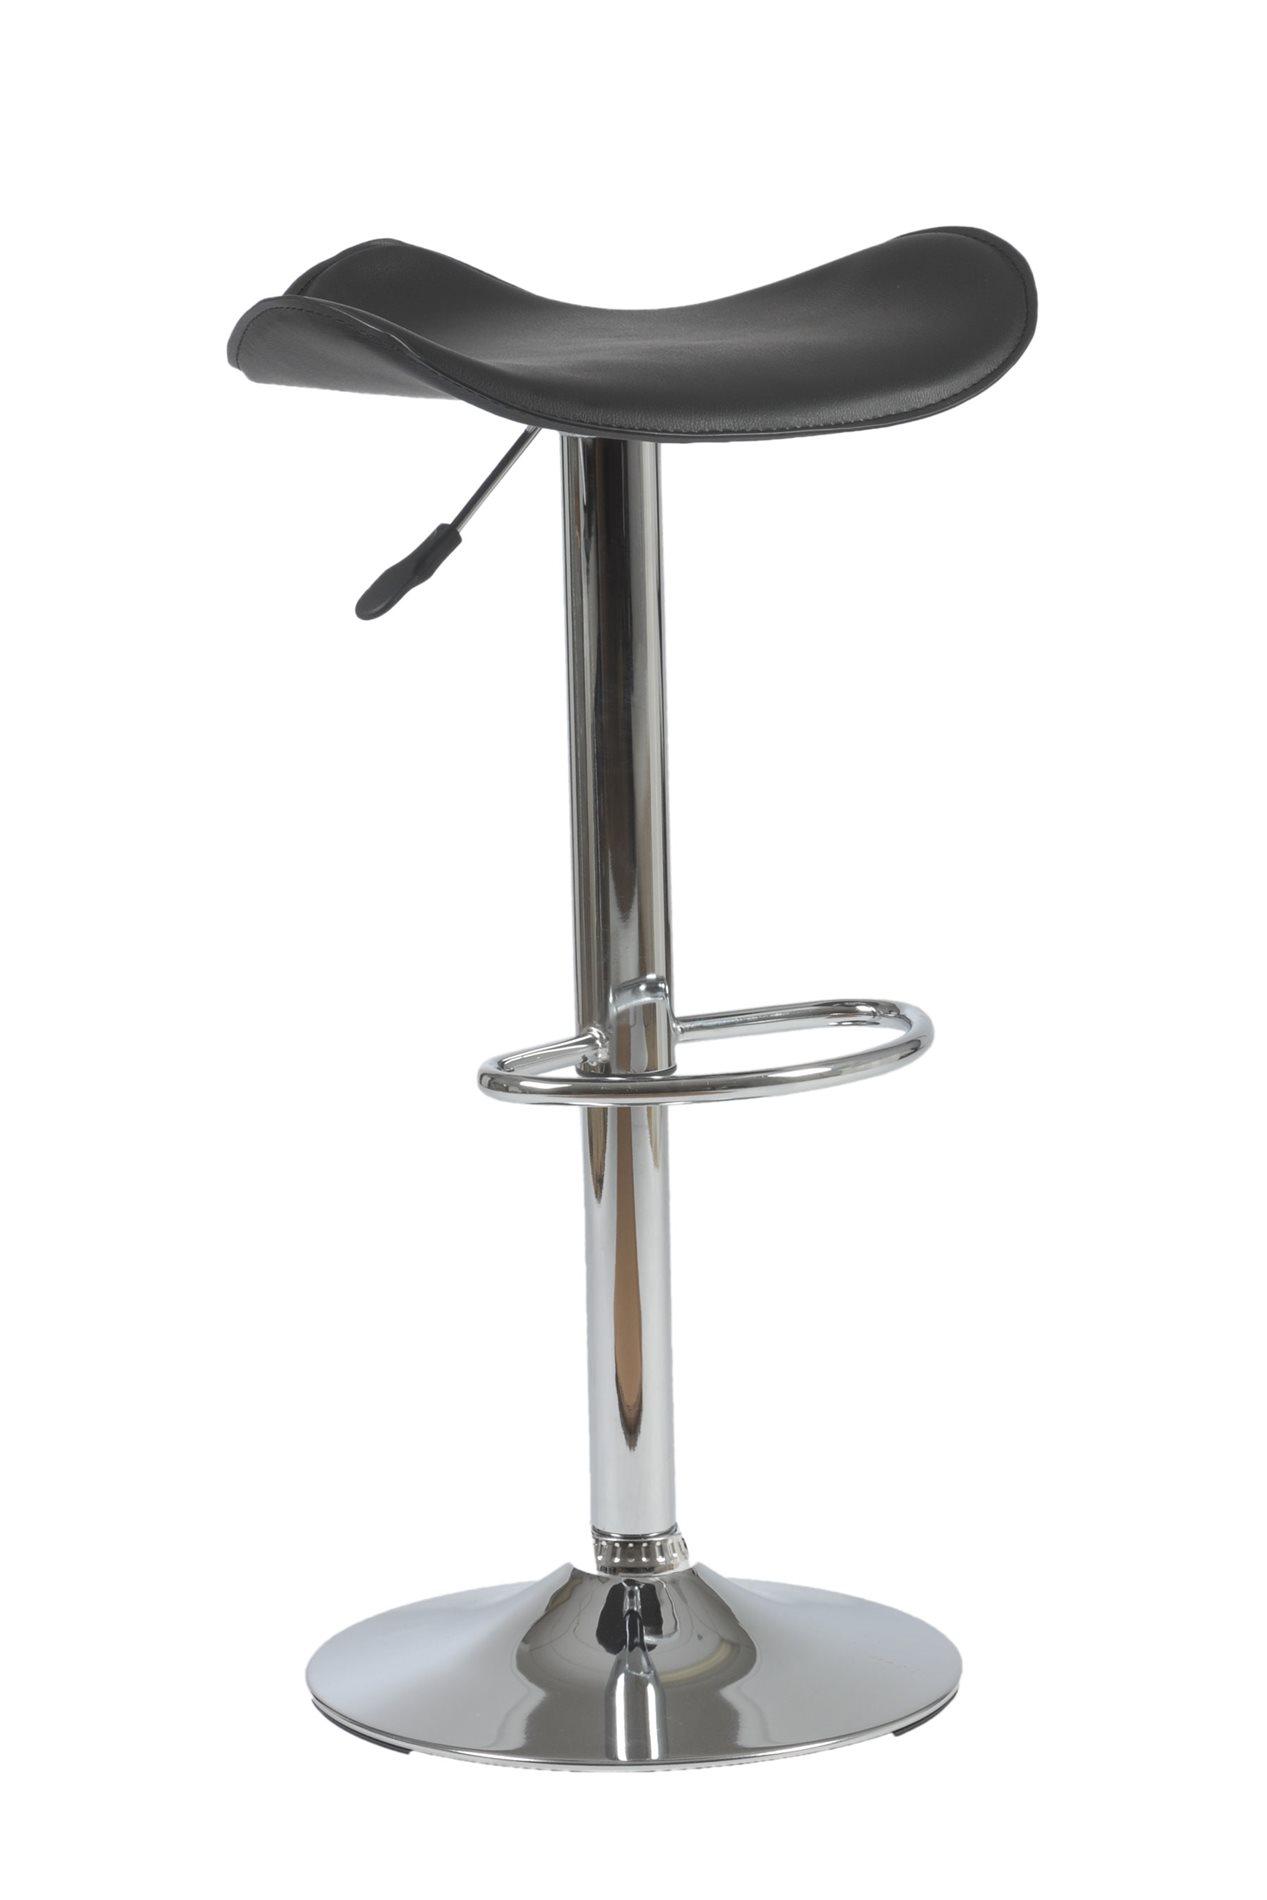 Euro Style 04371 Fabia Bar Counter Stool Ers 04371